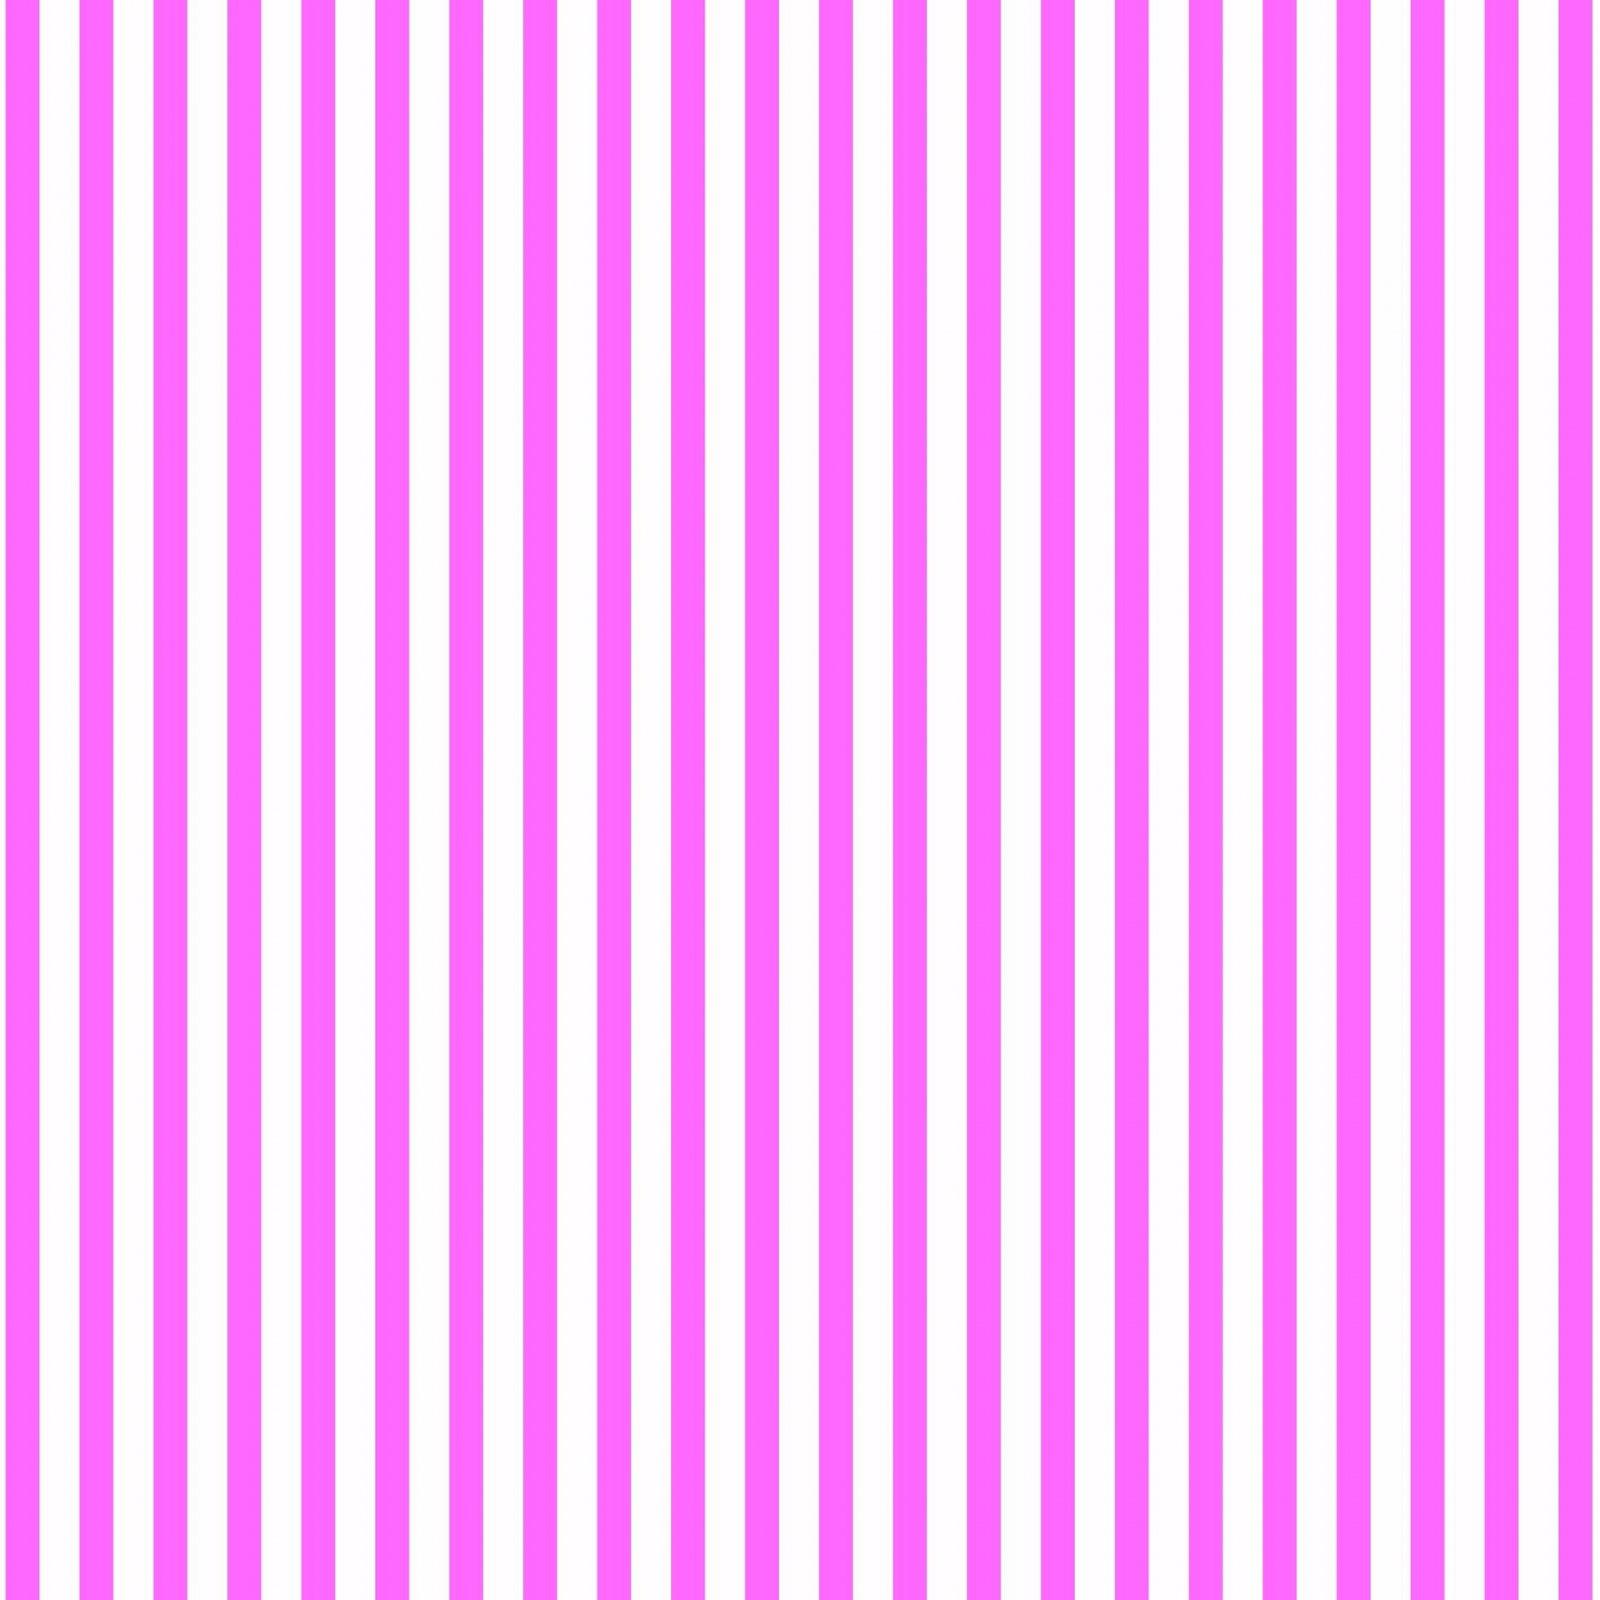 Back to Basics by Dashwood Studio 1600 - Stripes - Candy